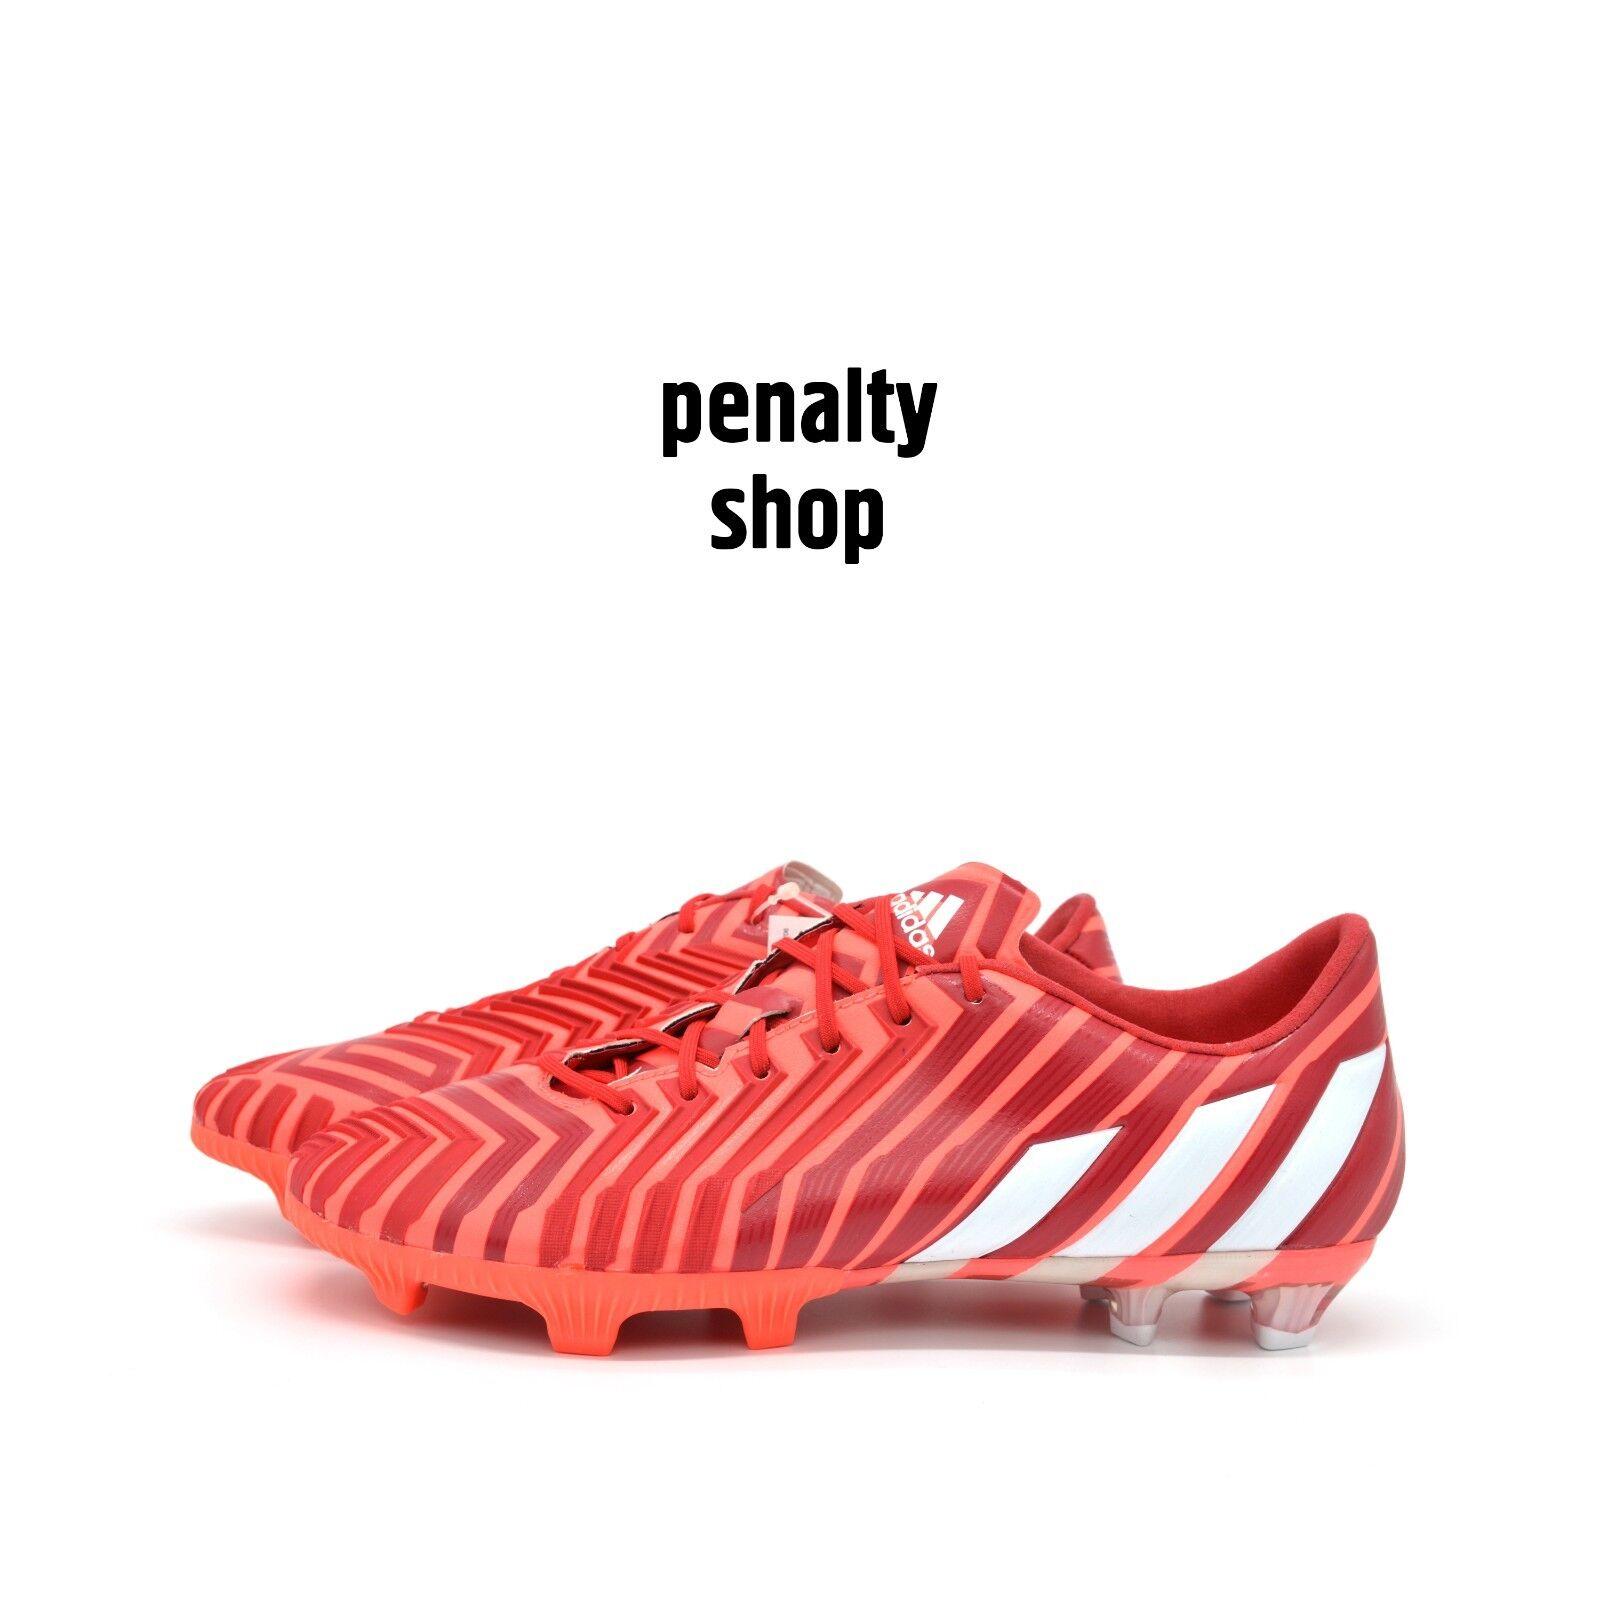 Adidas ProjoATOR INSTINCT FG Mujeres B44267 Rara Edición Limitada